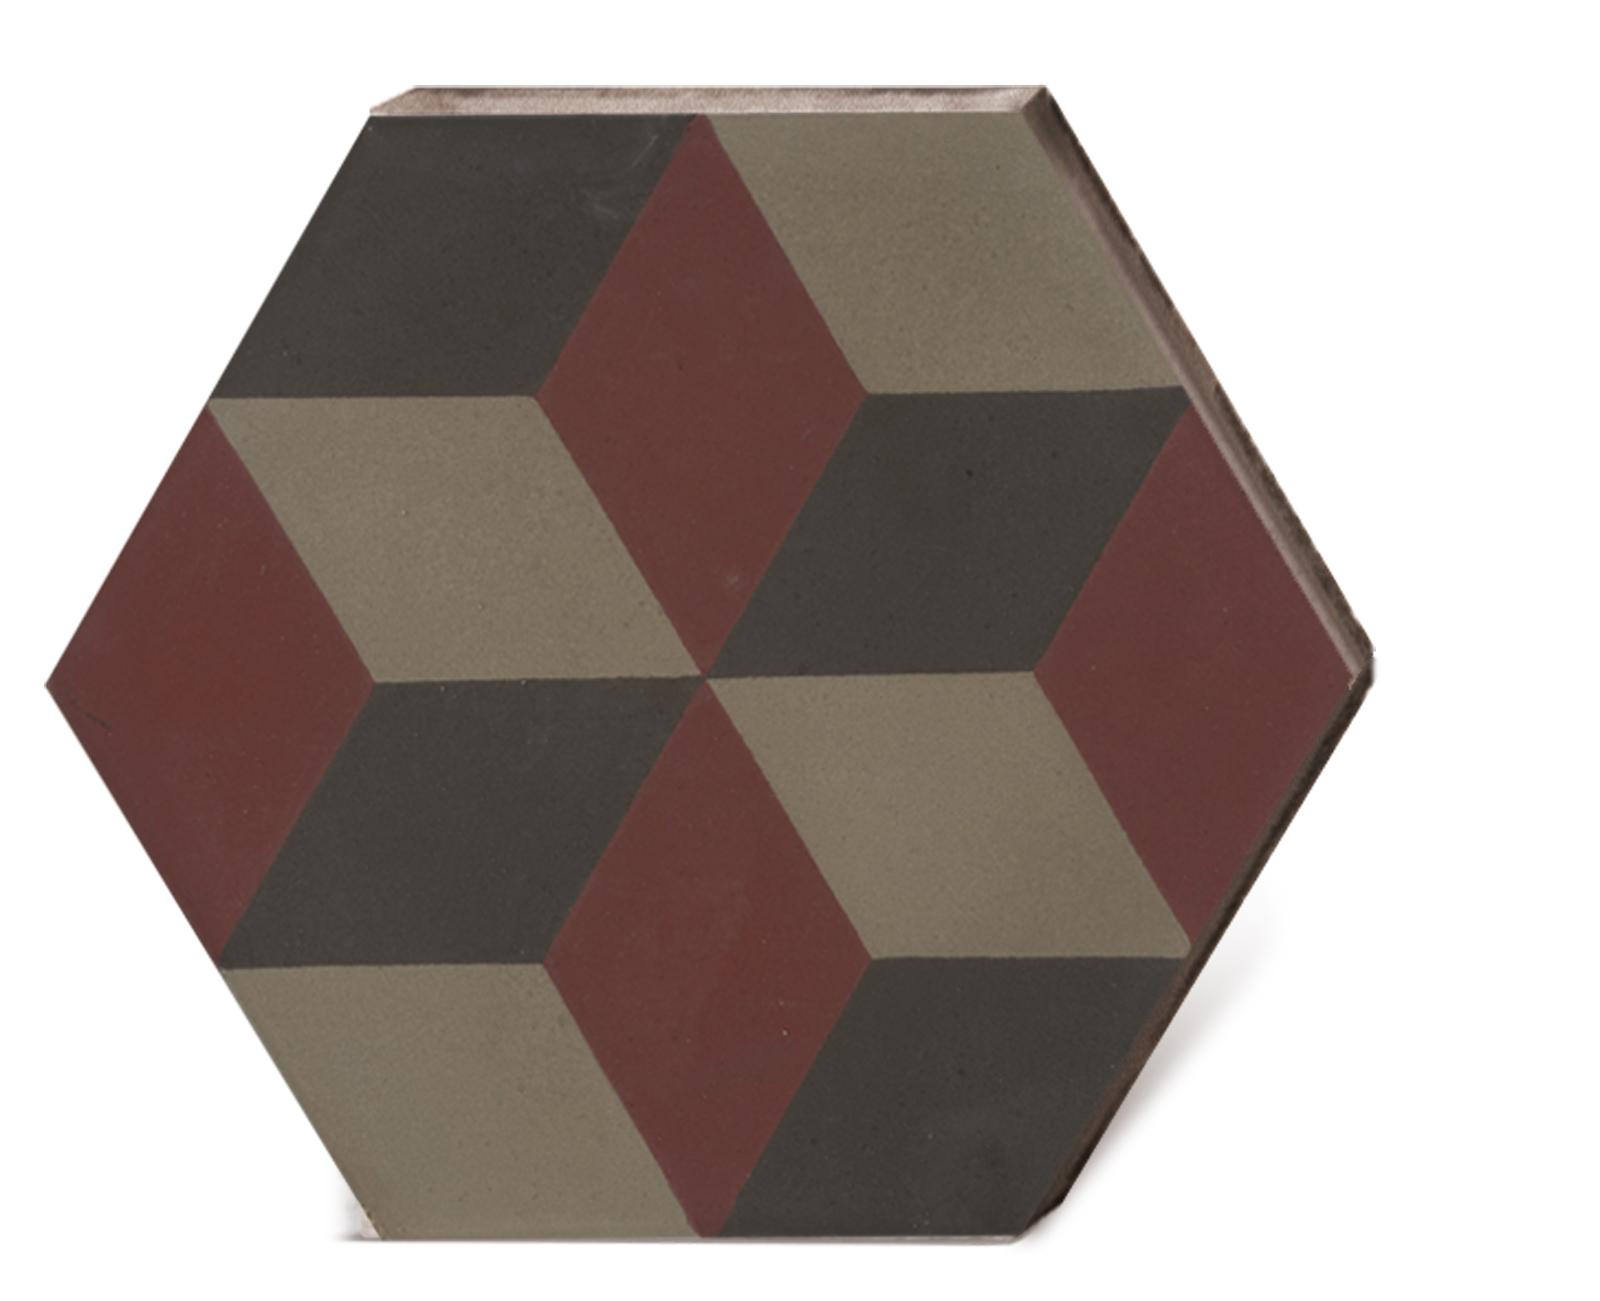 zementfliesen-verlegemuster-51105-3D-viaplatten